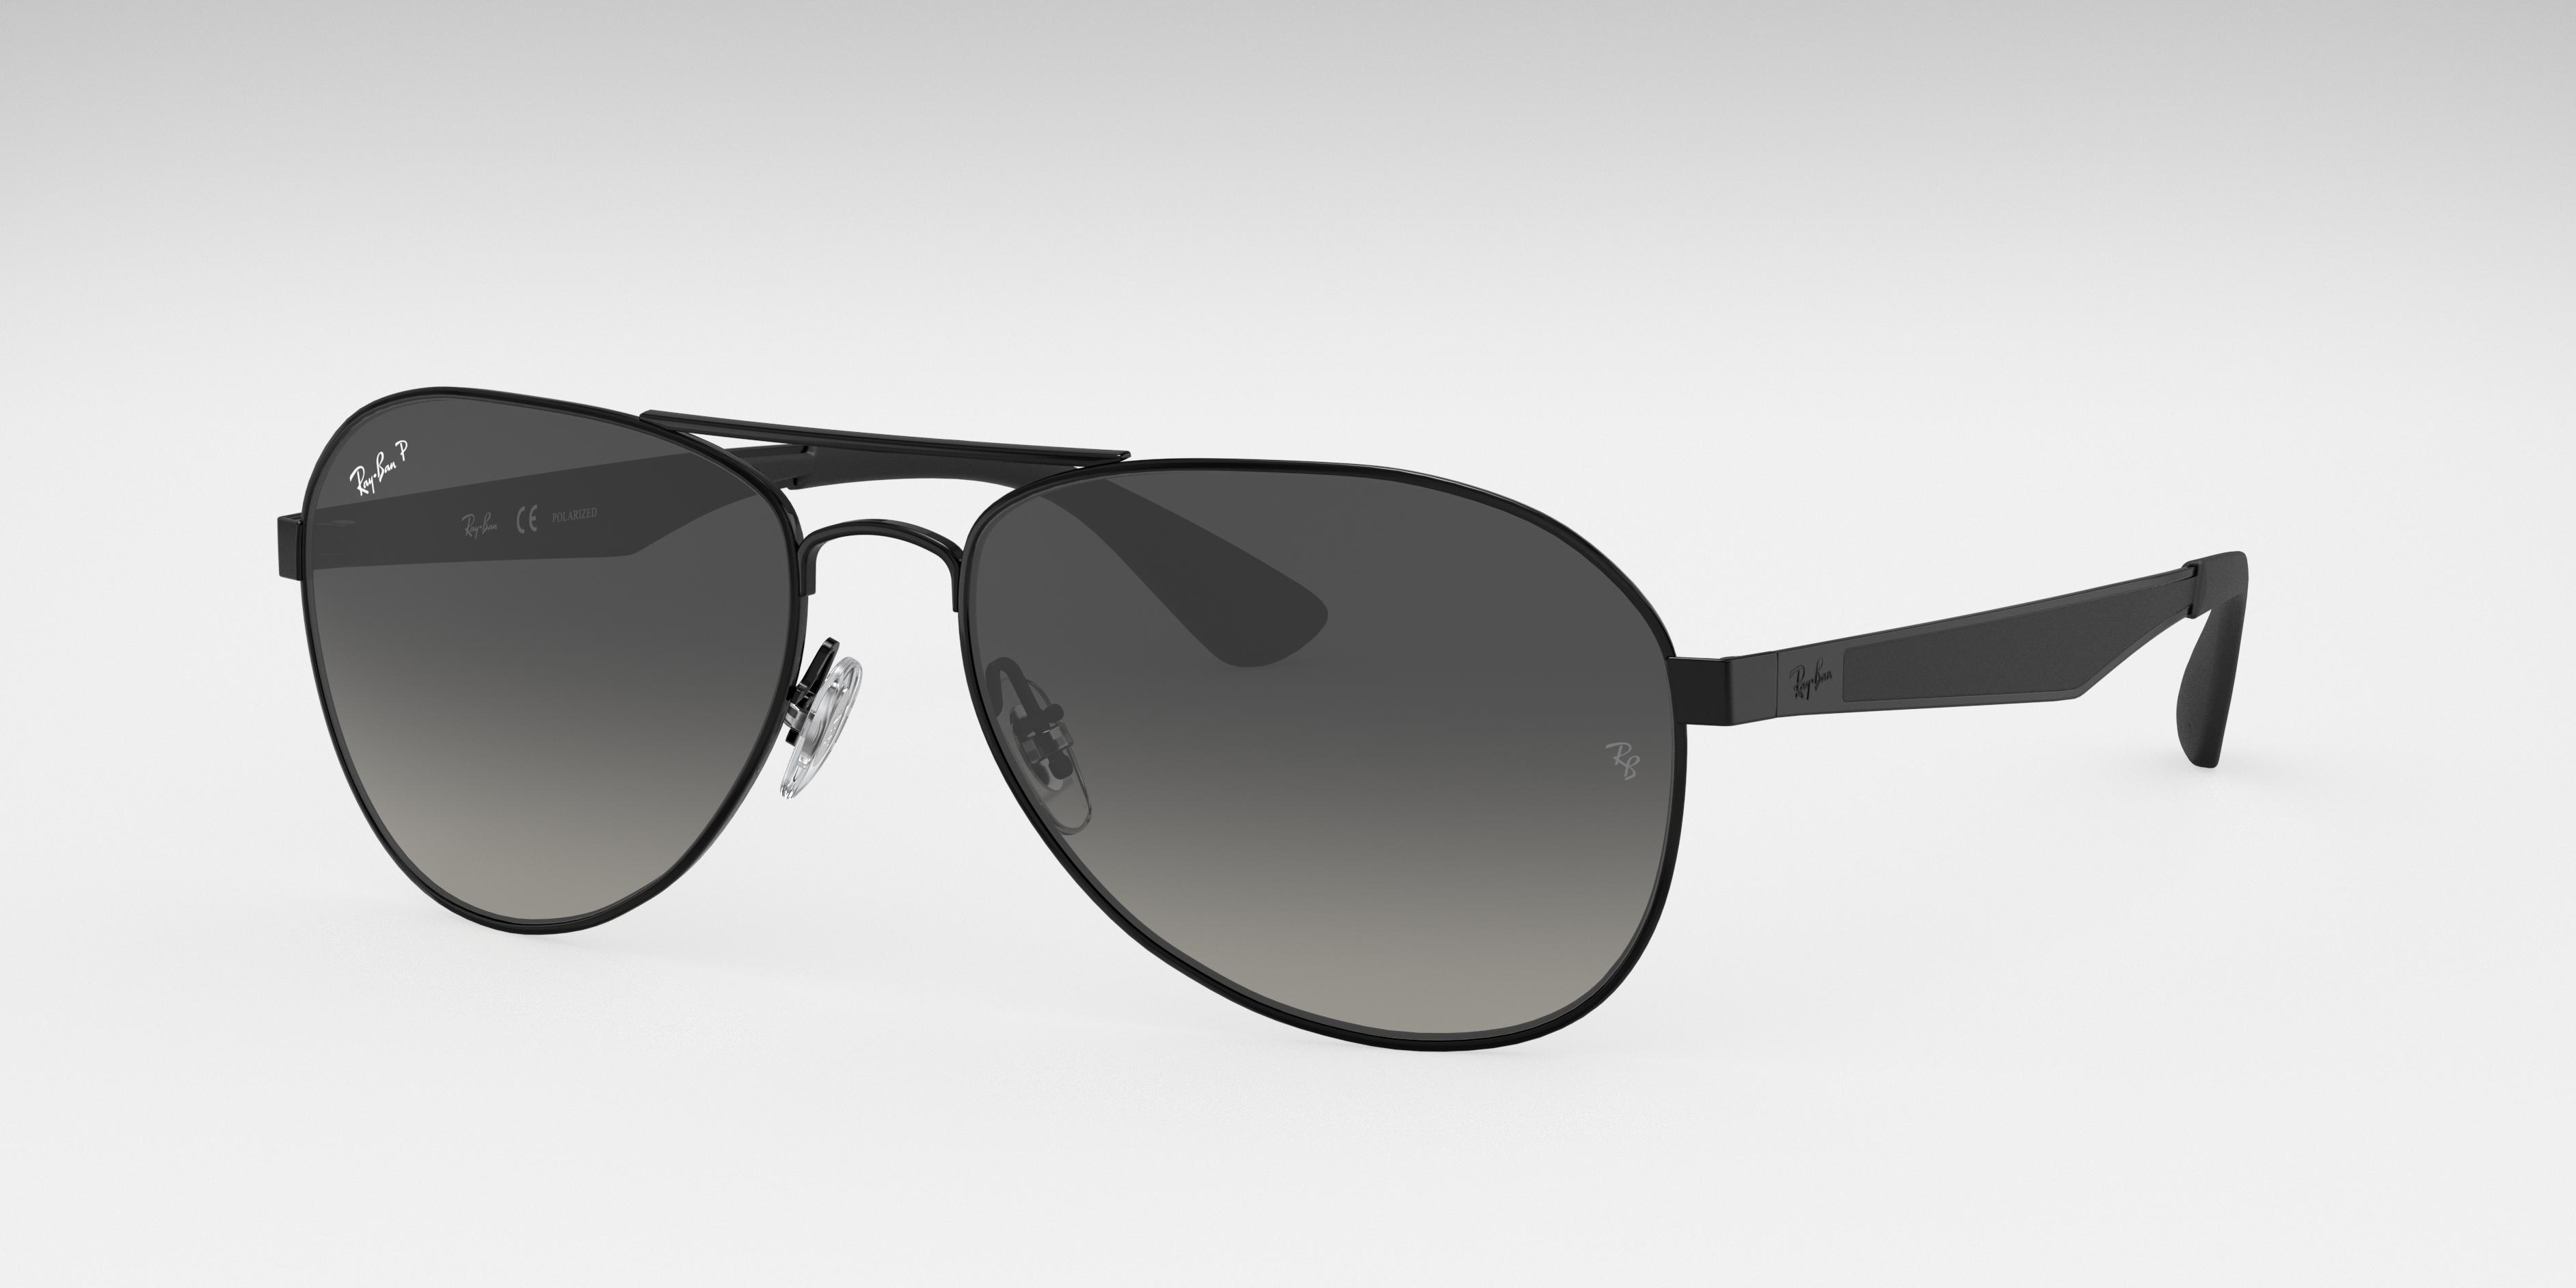 Ray-Ban Rb3549 Black, Polarized Gray Lenses - RB3549